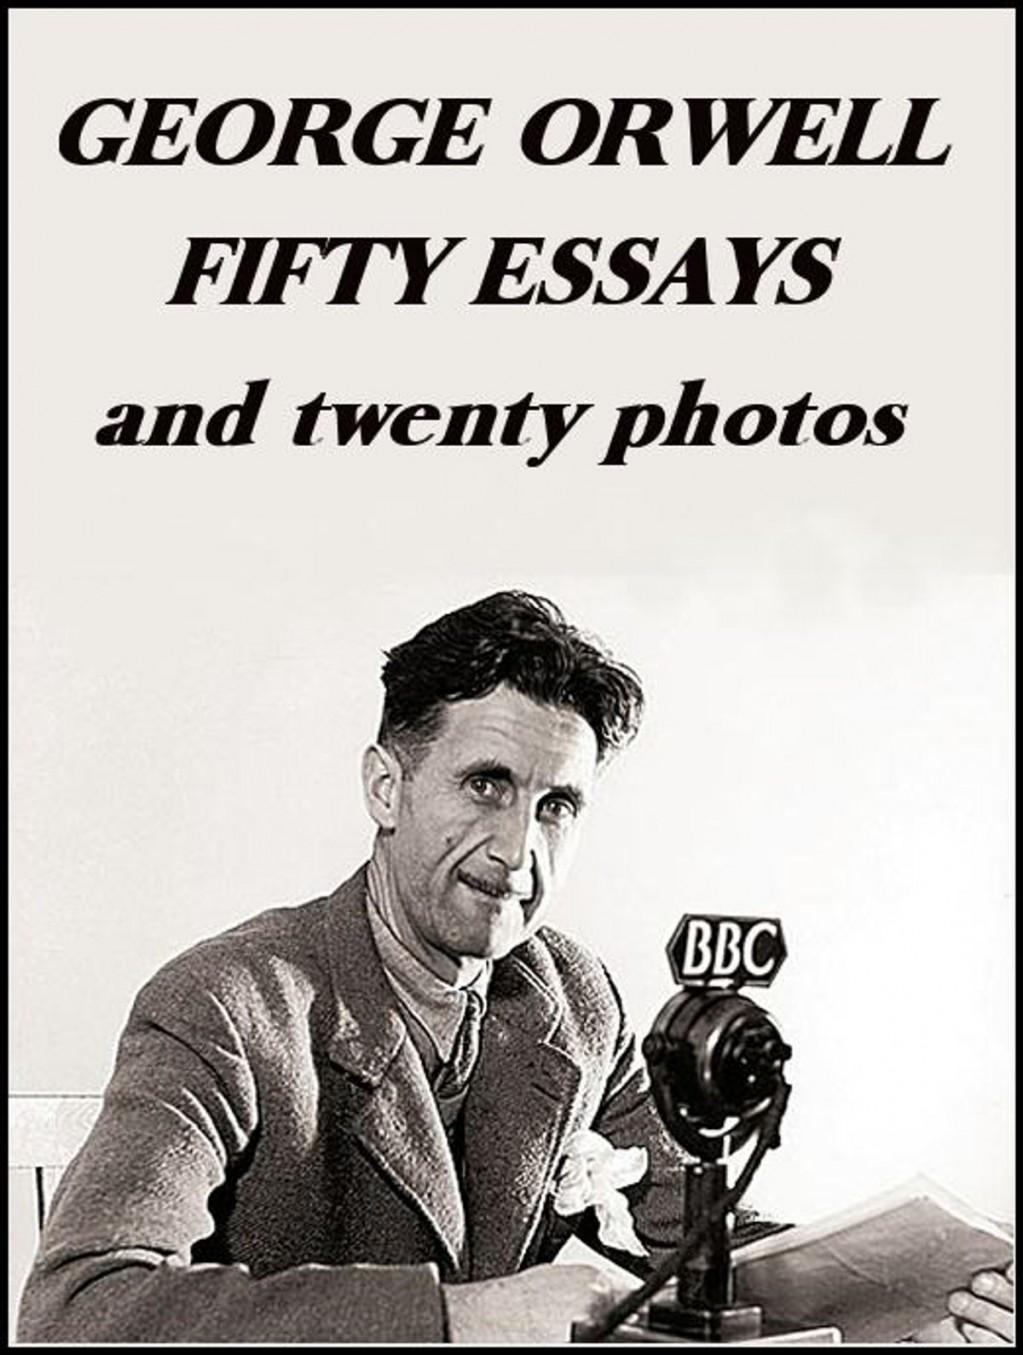 010 Essay Example George Orwell Fifty Frightening Essays Everyman's Library Summary Bookshop Memories Large